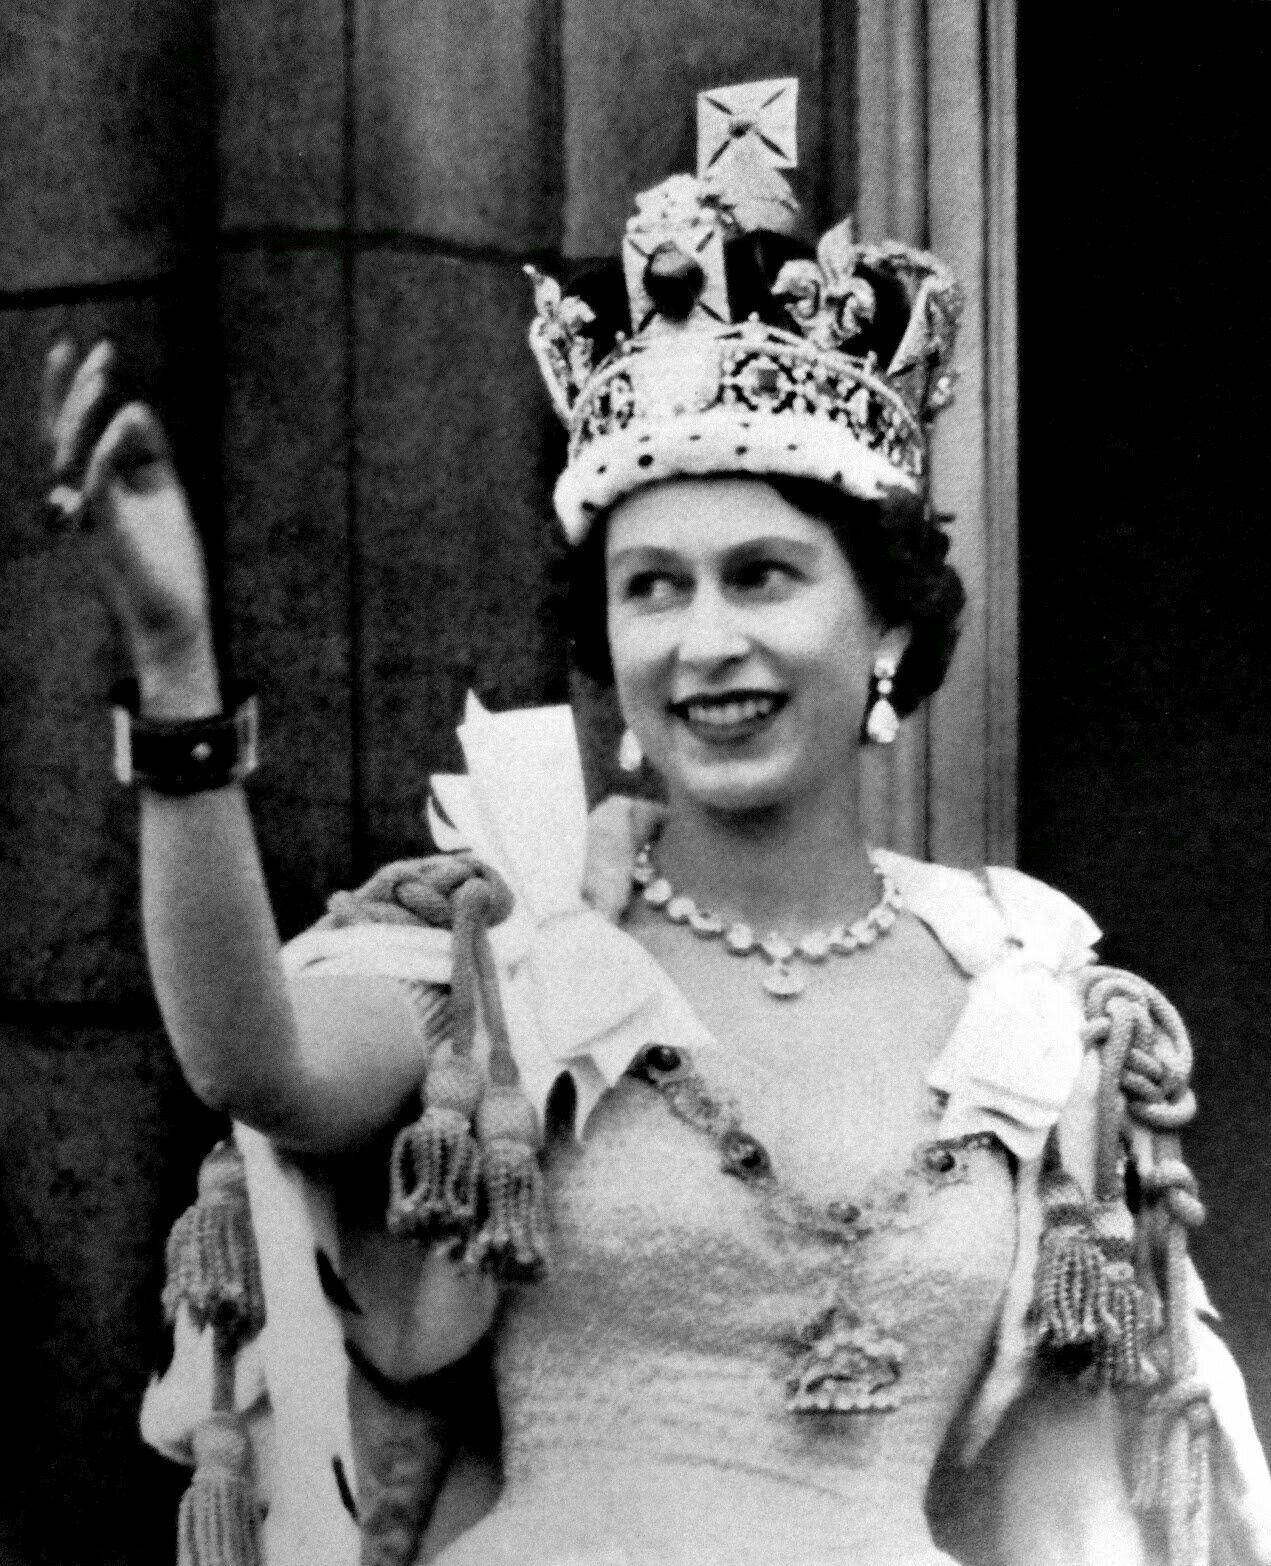 Queen Elizabeth in her younger years. God Save the Queen